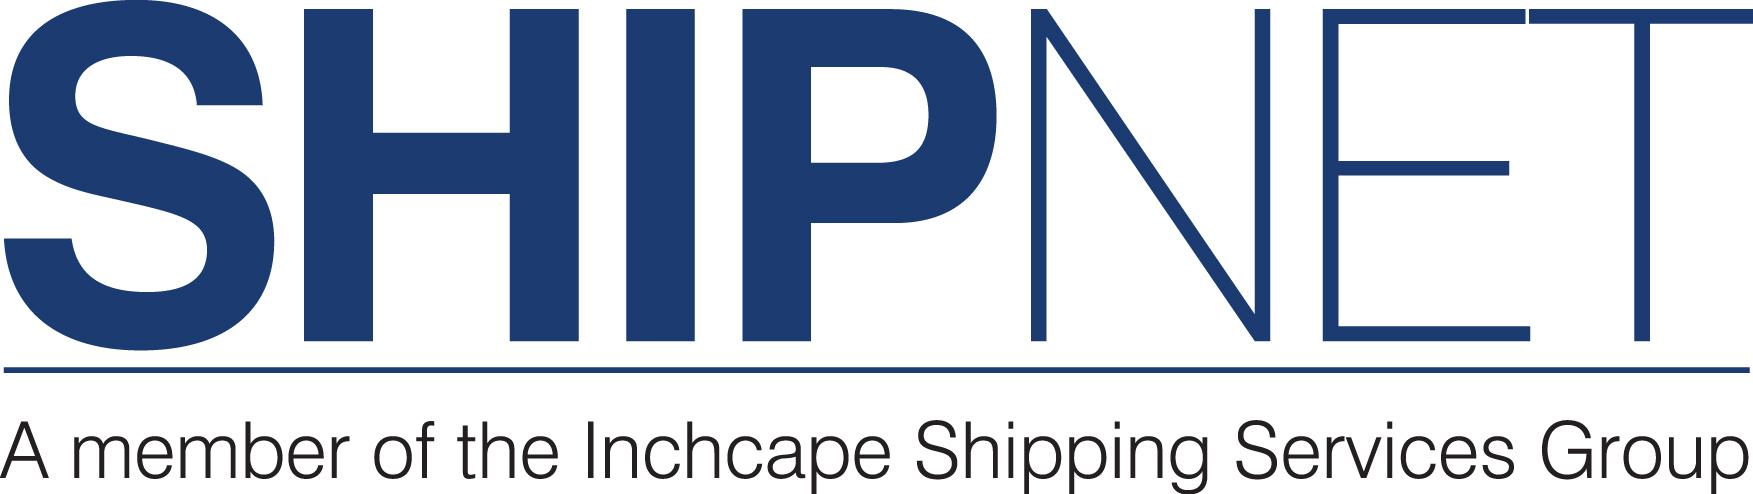 shipnet_logo